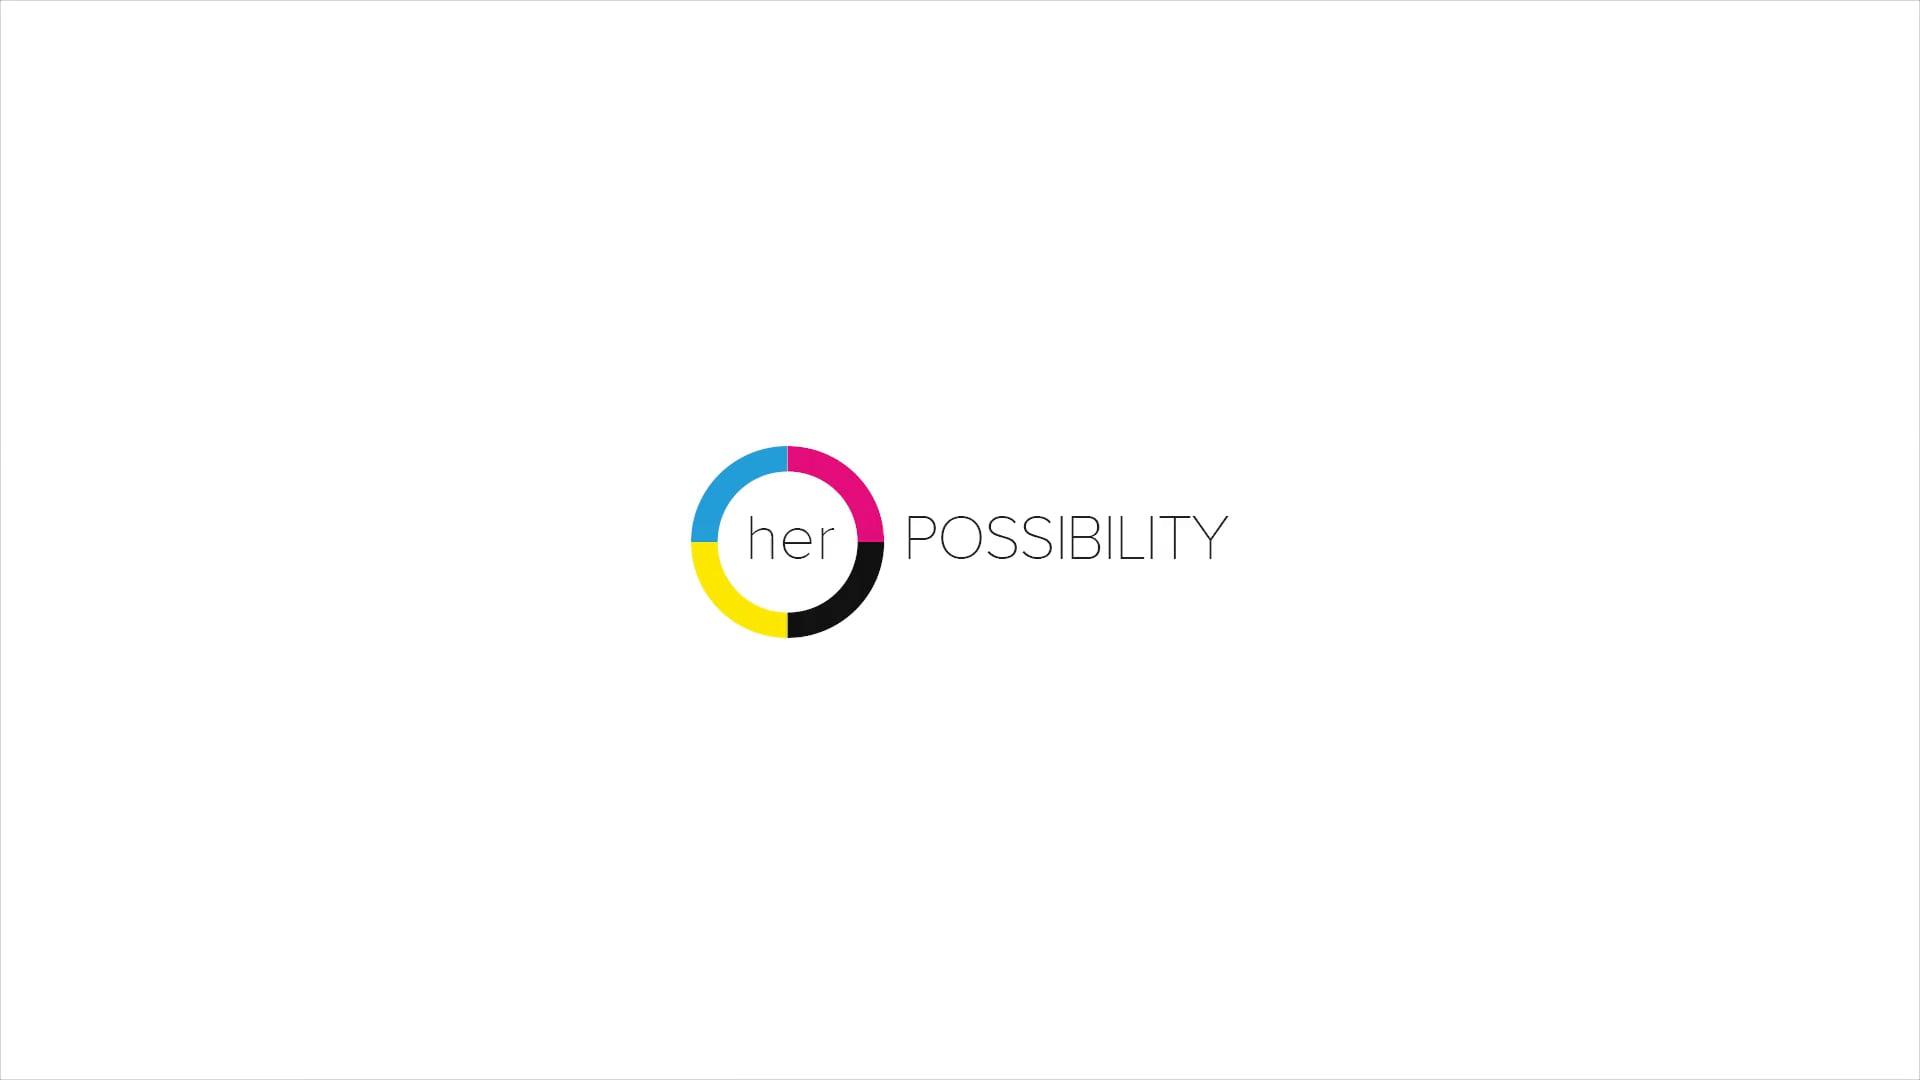 herPossibility